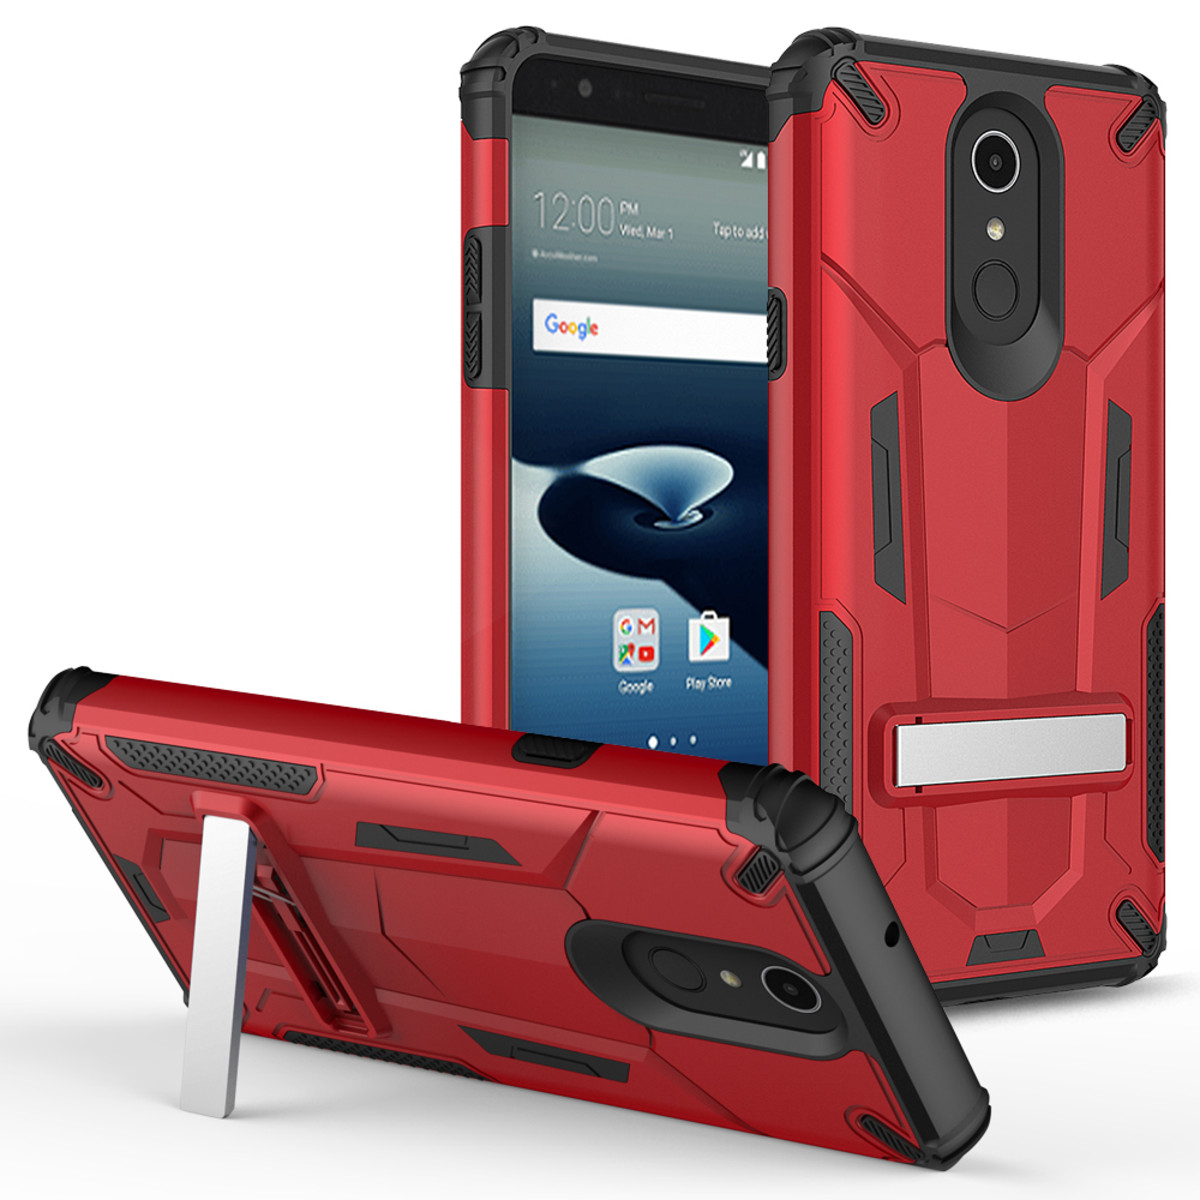 LG Stylo 4 Hybrid Transformer Case W/Kickstand Red